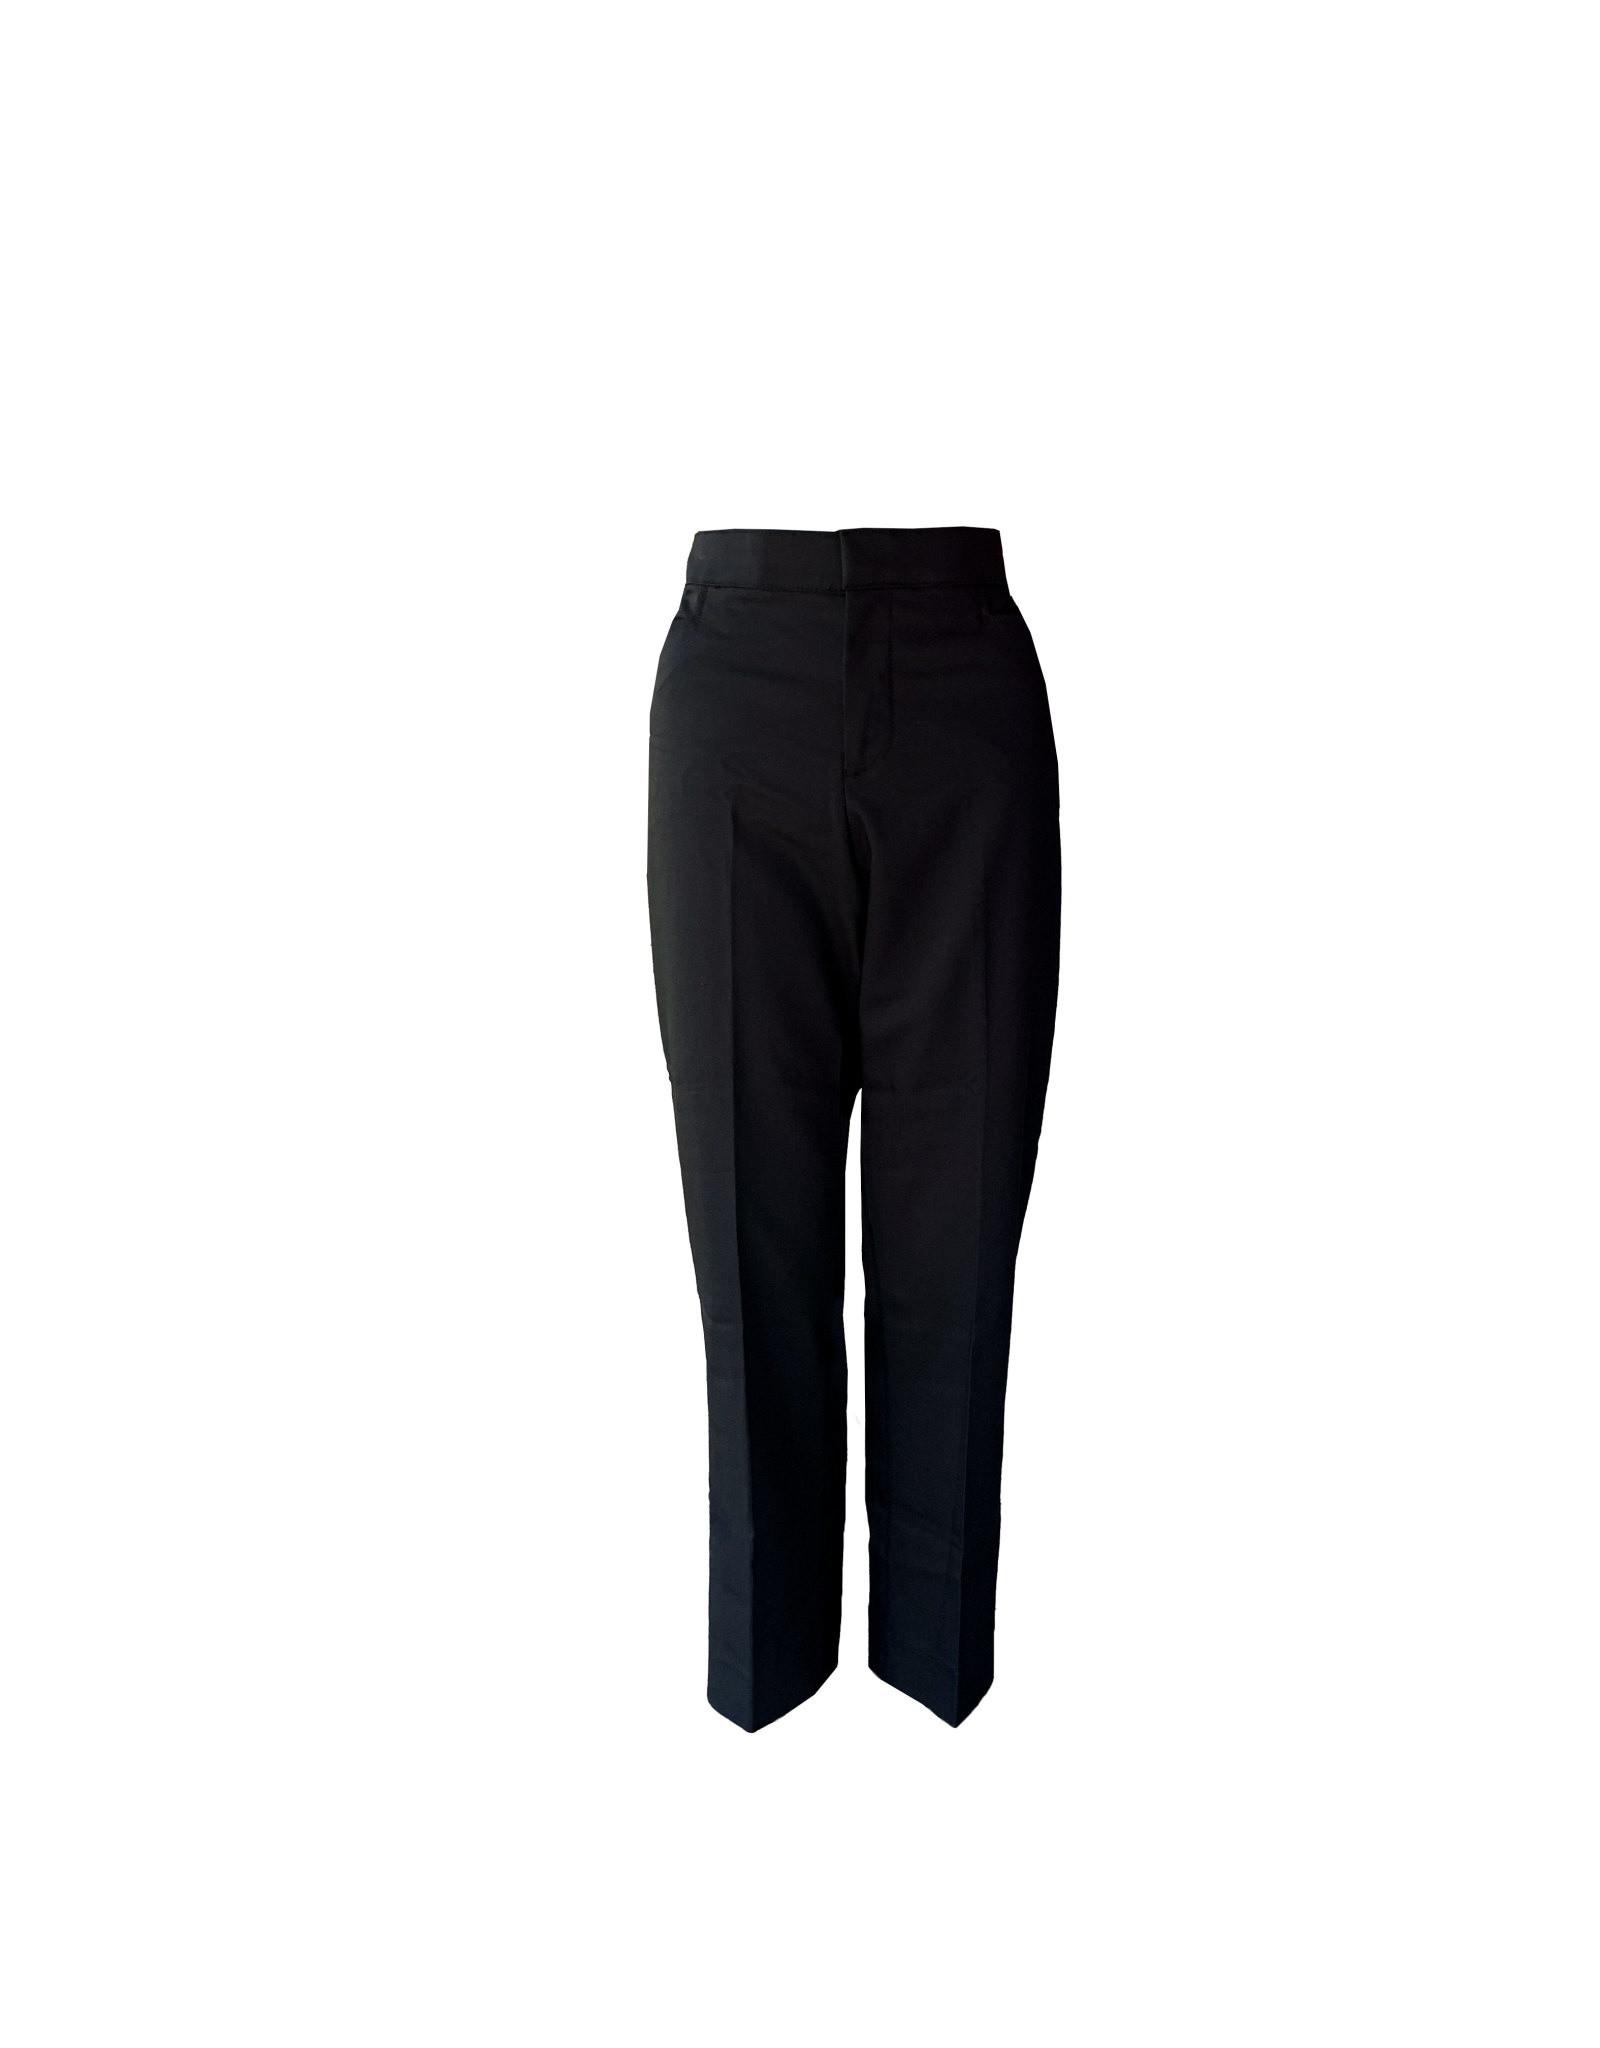 CHAPS CHAPS  Short Length Slimming Fit Size  14